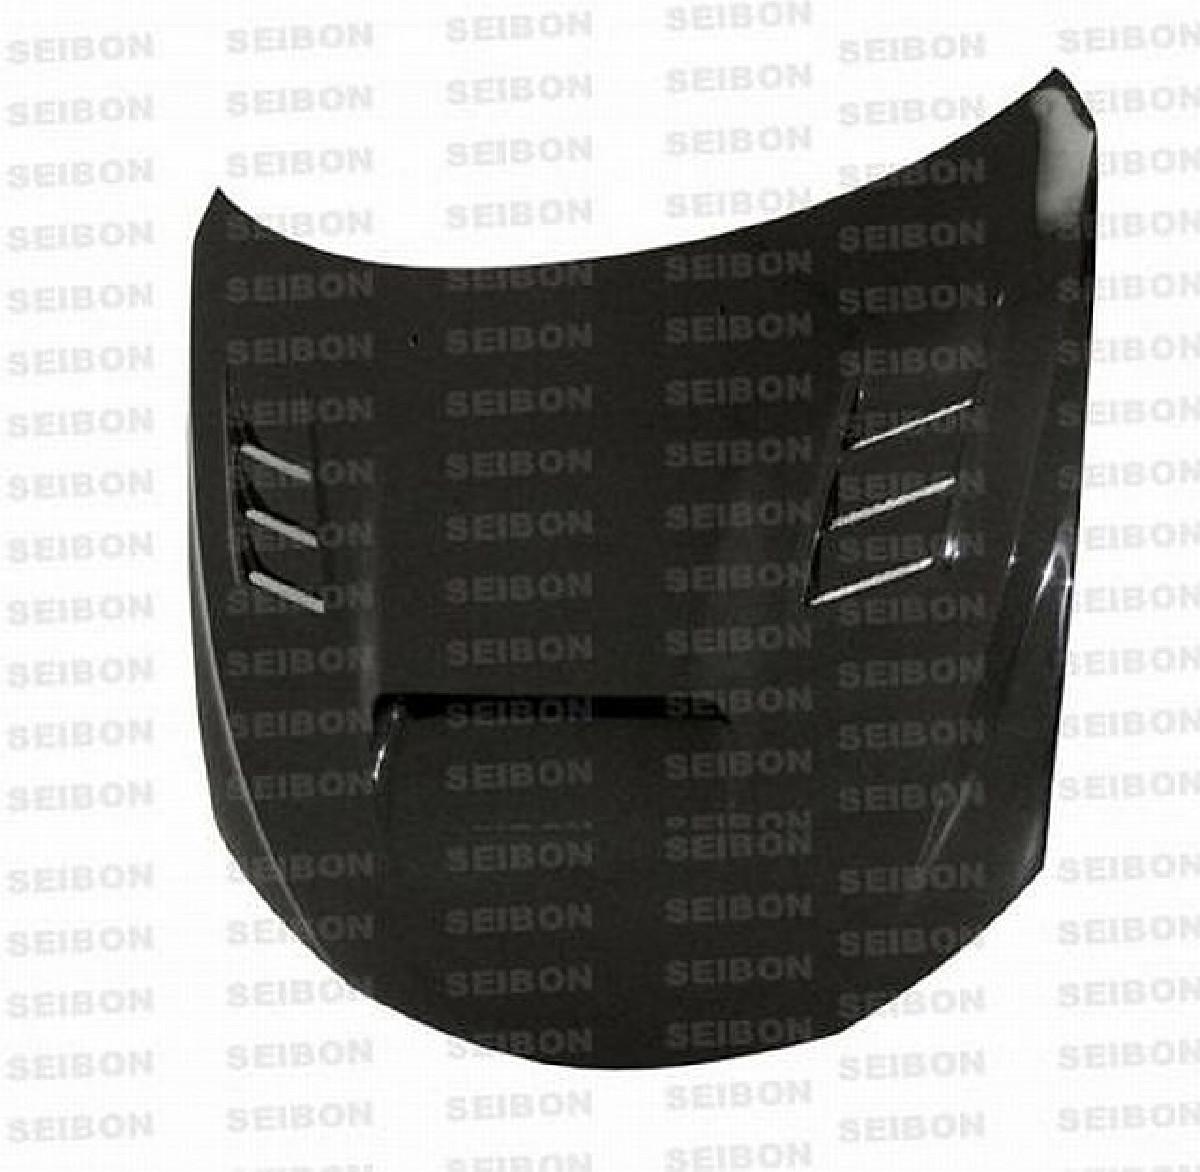 Seibon CW Carbon Motorhaube Subaru Impreza WRX/STI 07-